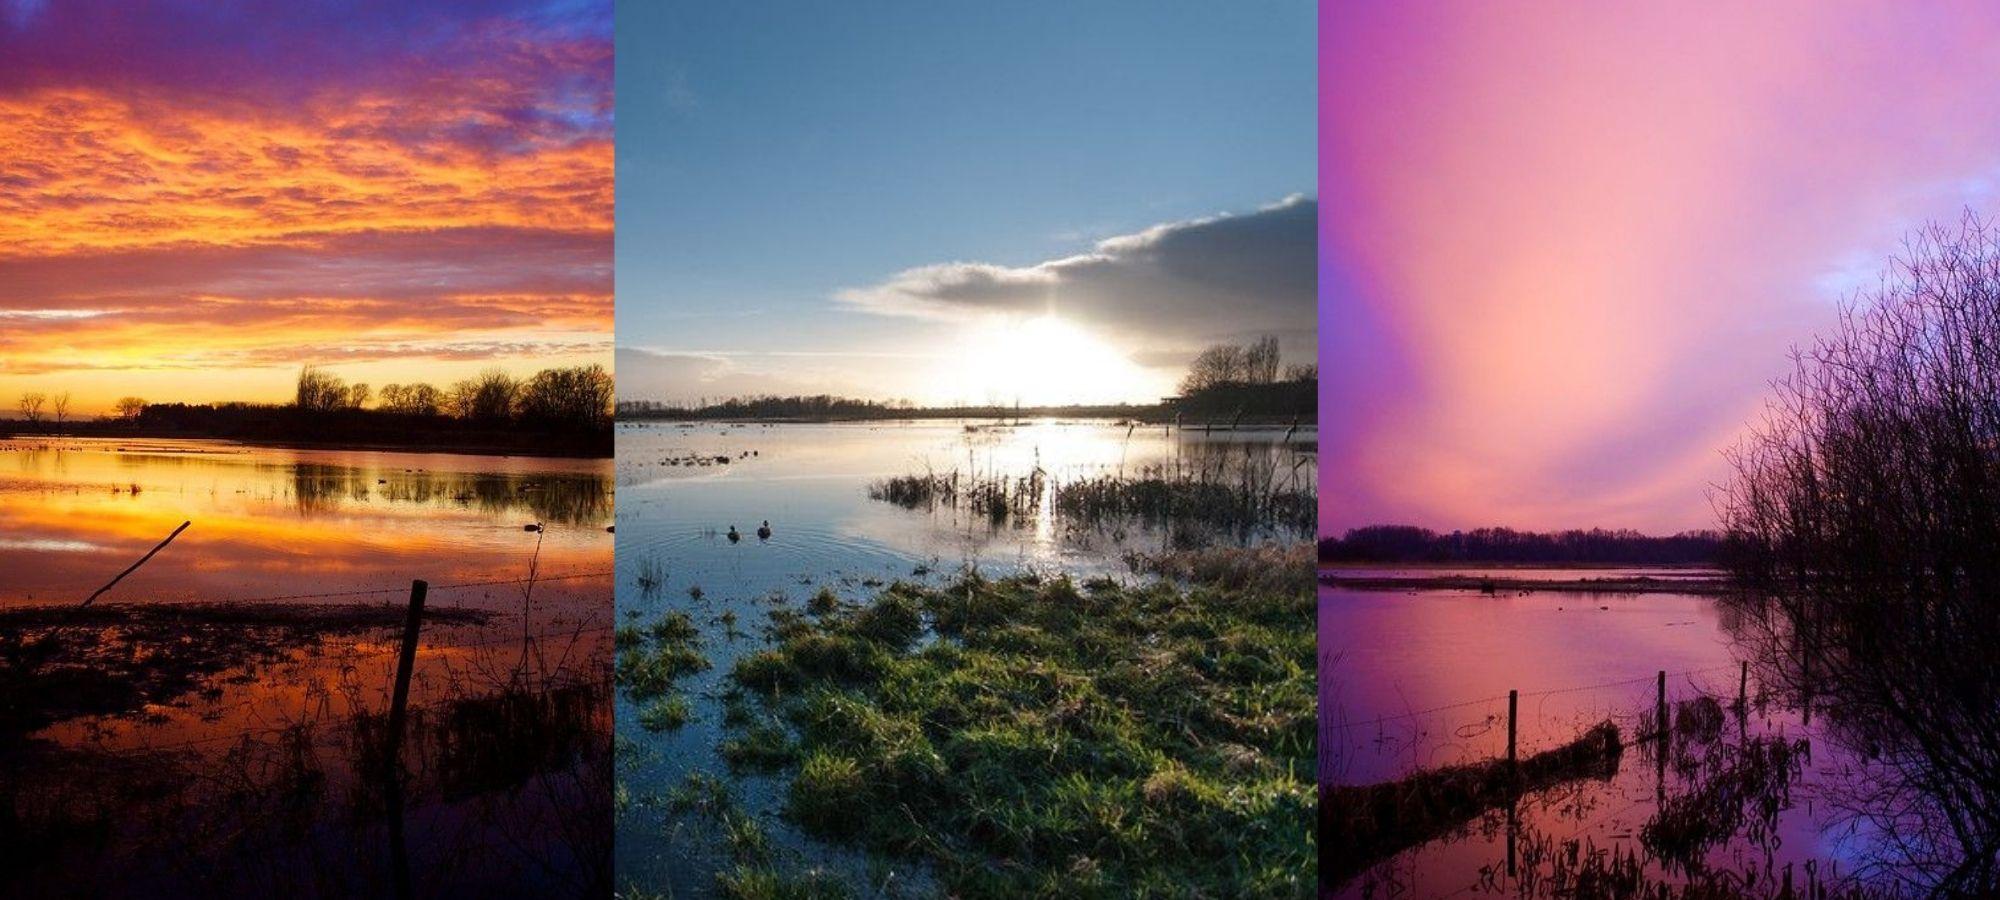 Sunset and sunrise at nature reserve Bourgoyen-Ossemeersen